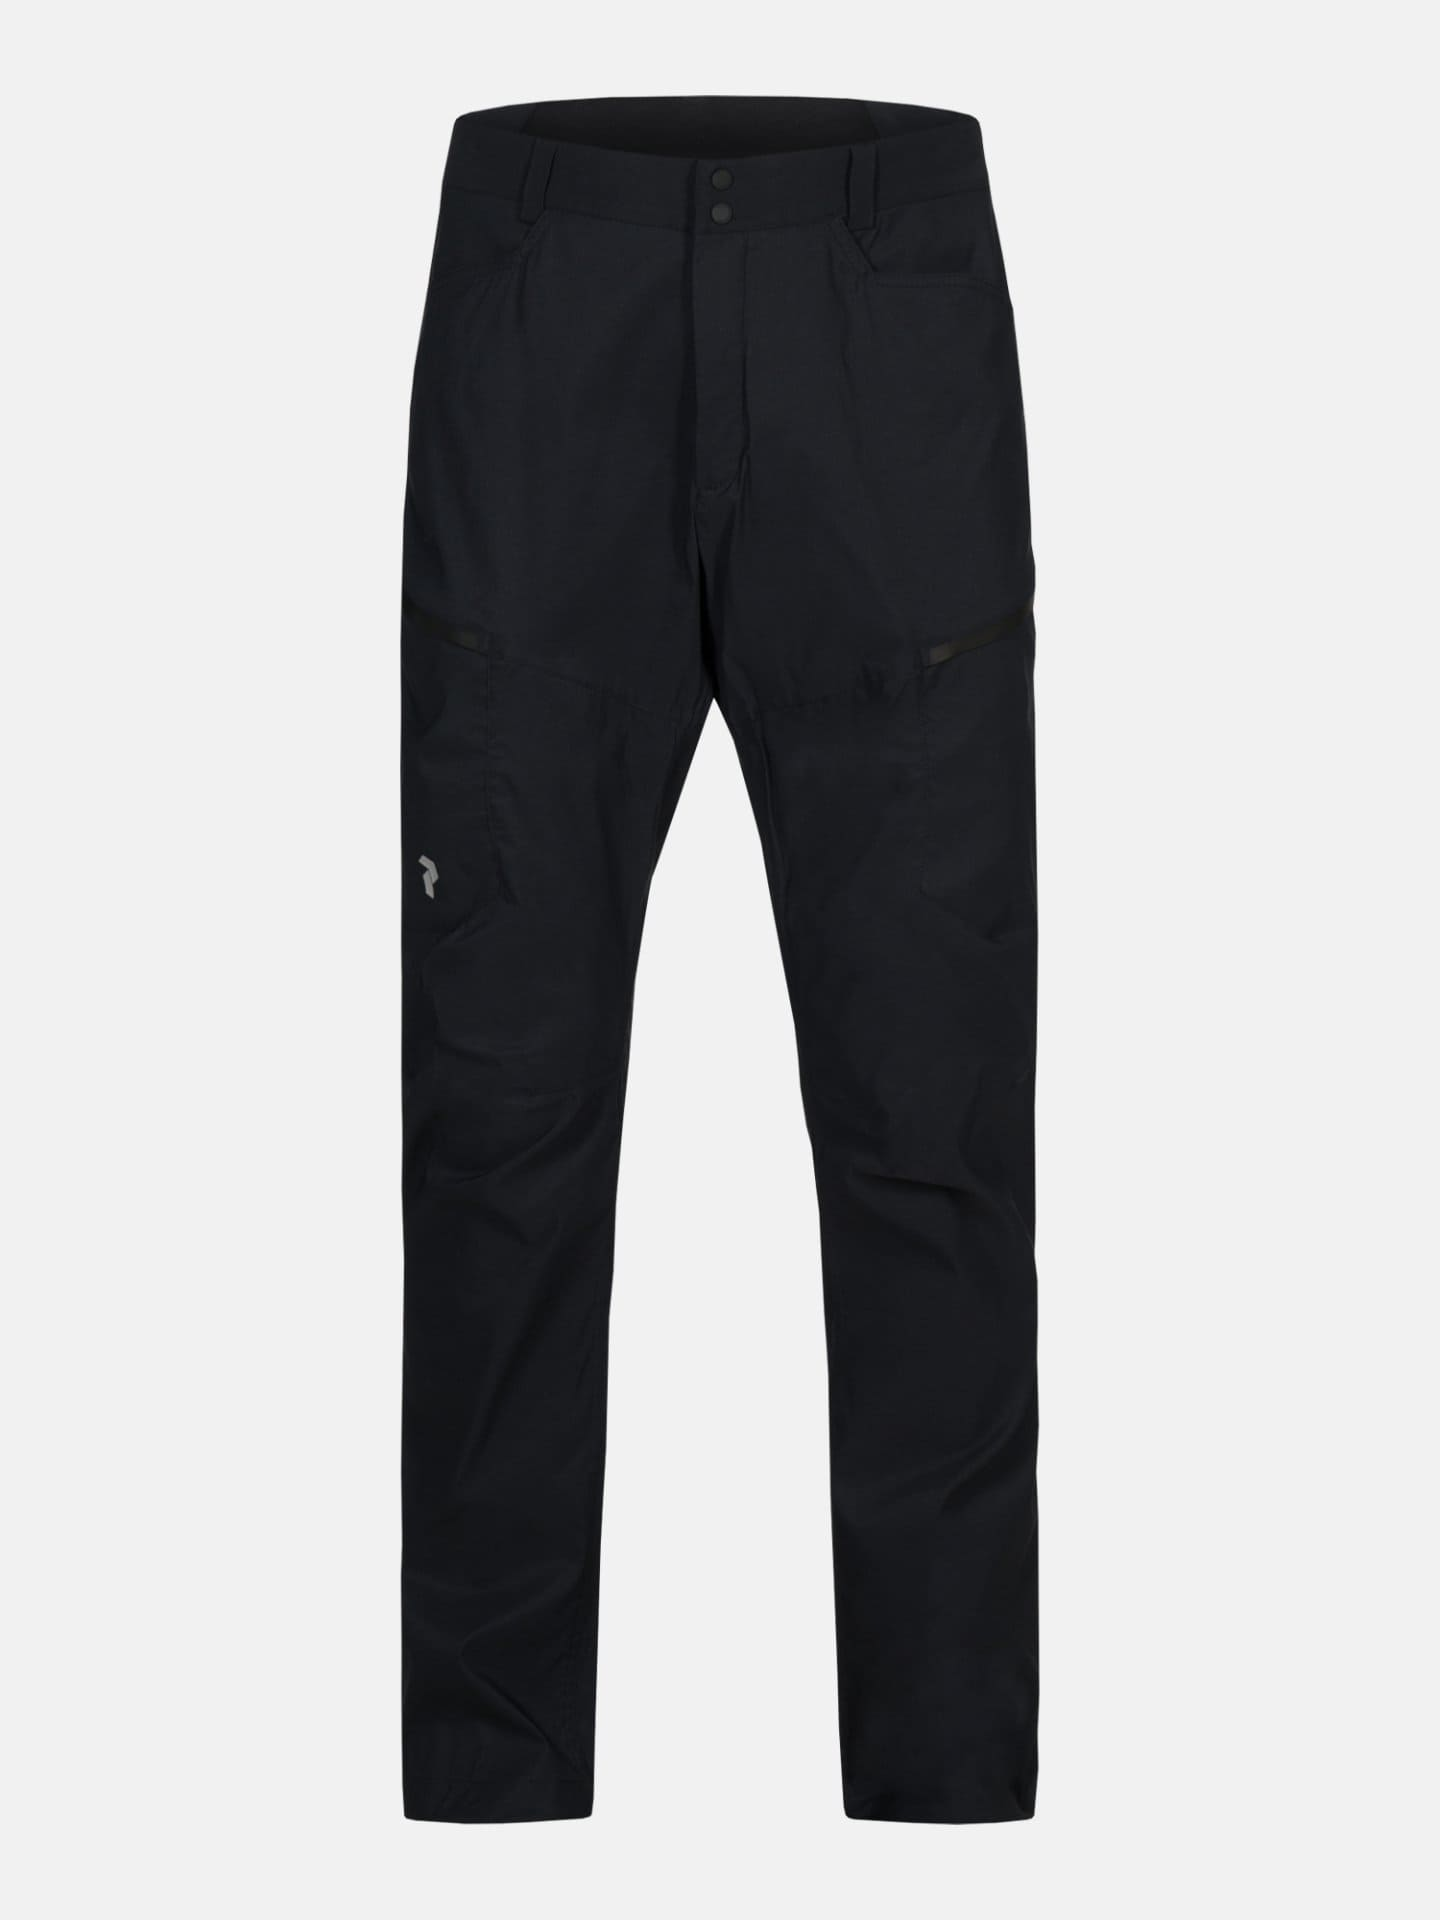 Peak Performance M Iconiq Cargo Pants 2021